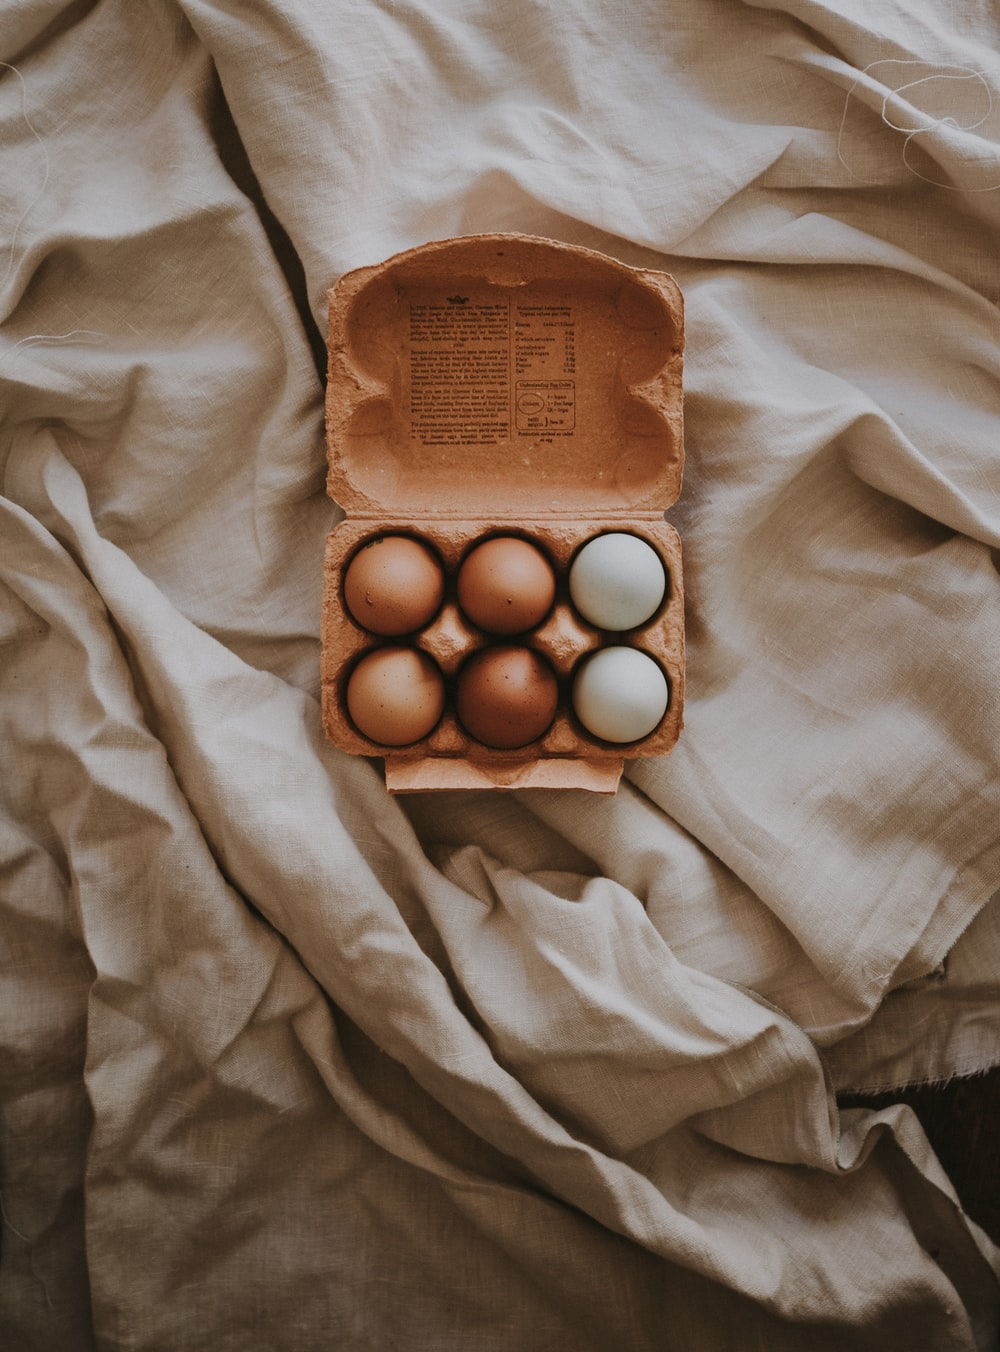 six eggs in box